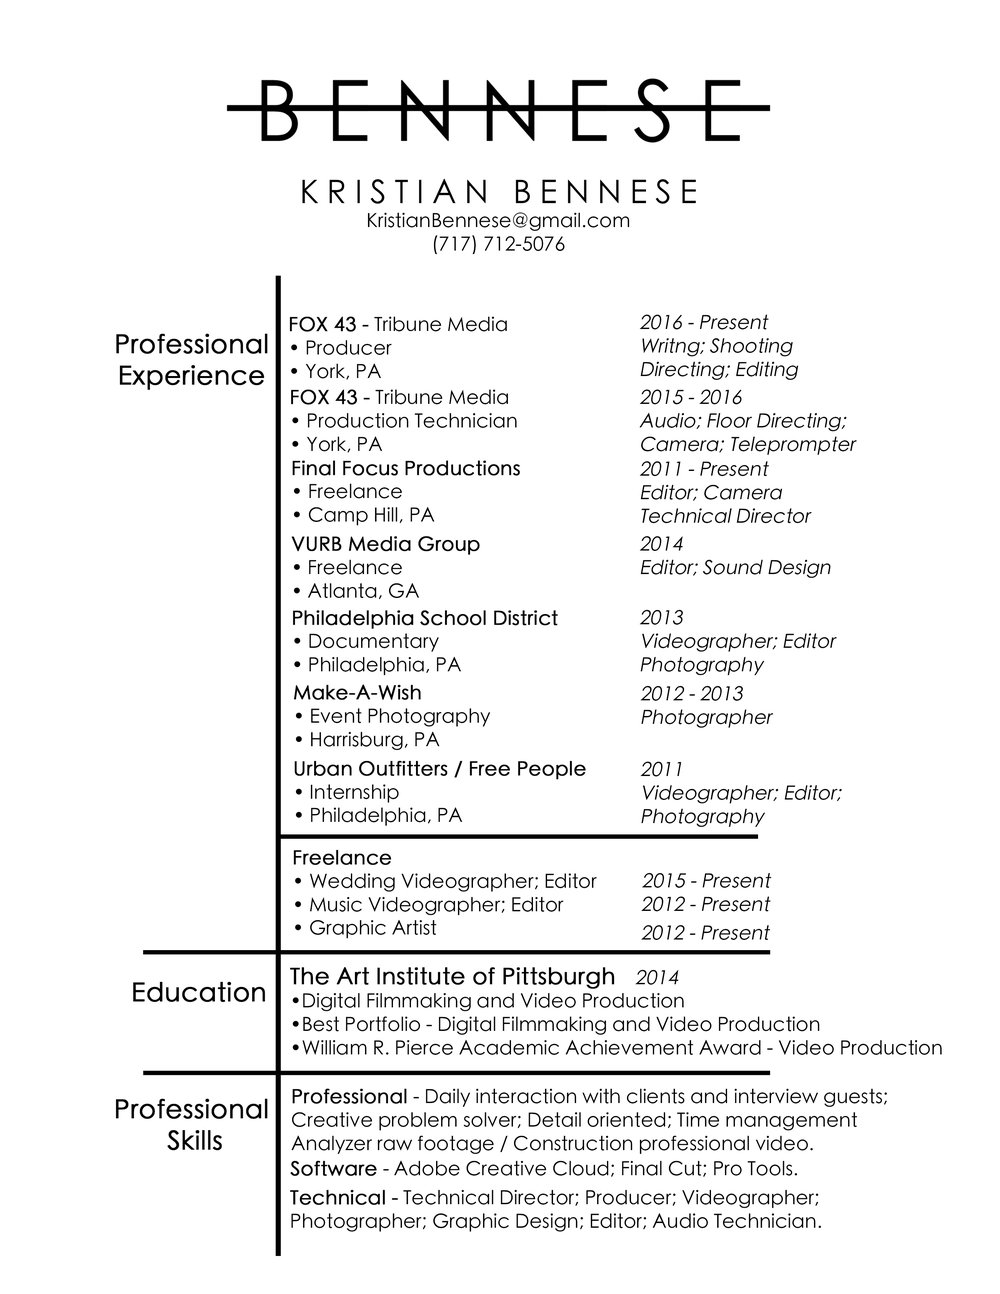 resume Urban Outfitters Resume resume bennese resume